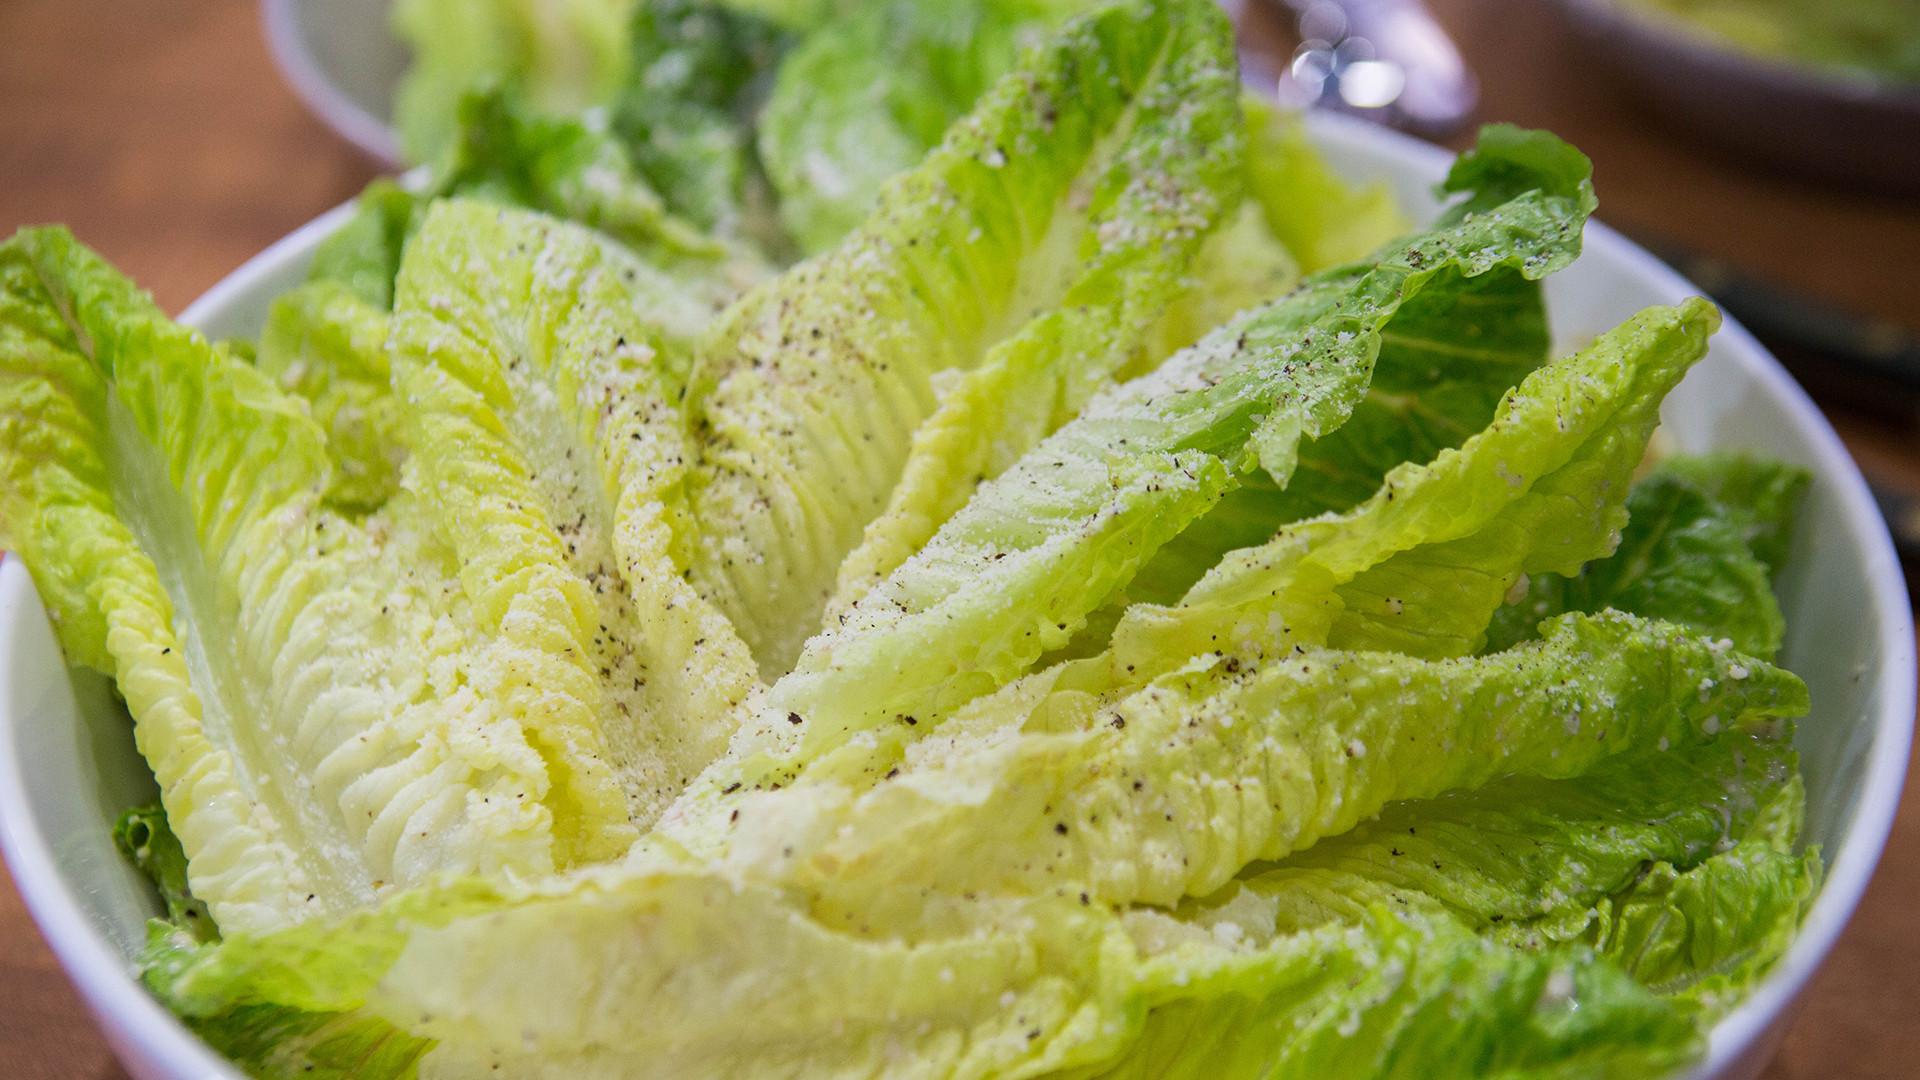 Semi Healthy Snacks  Lightened up Caesar salad & cacio e pepe kugel recipes